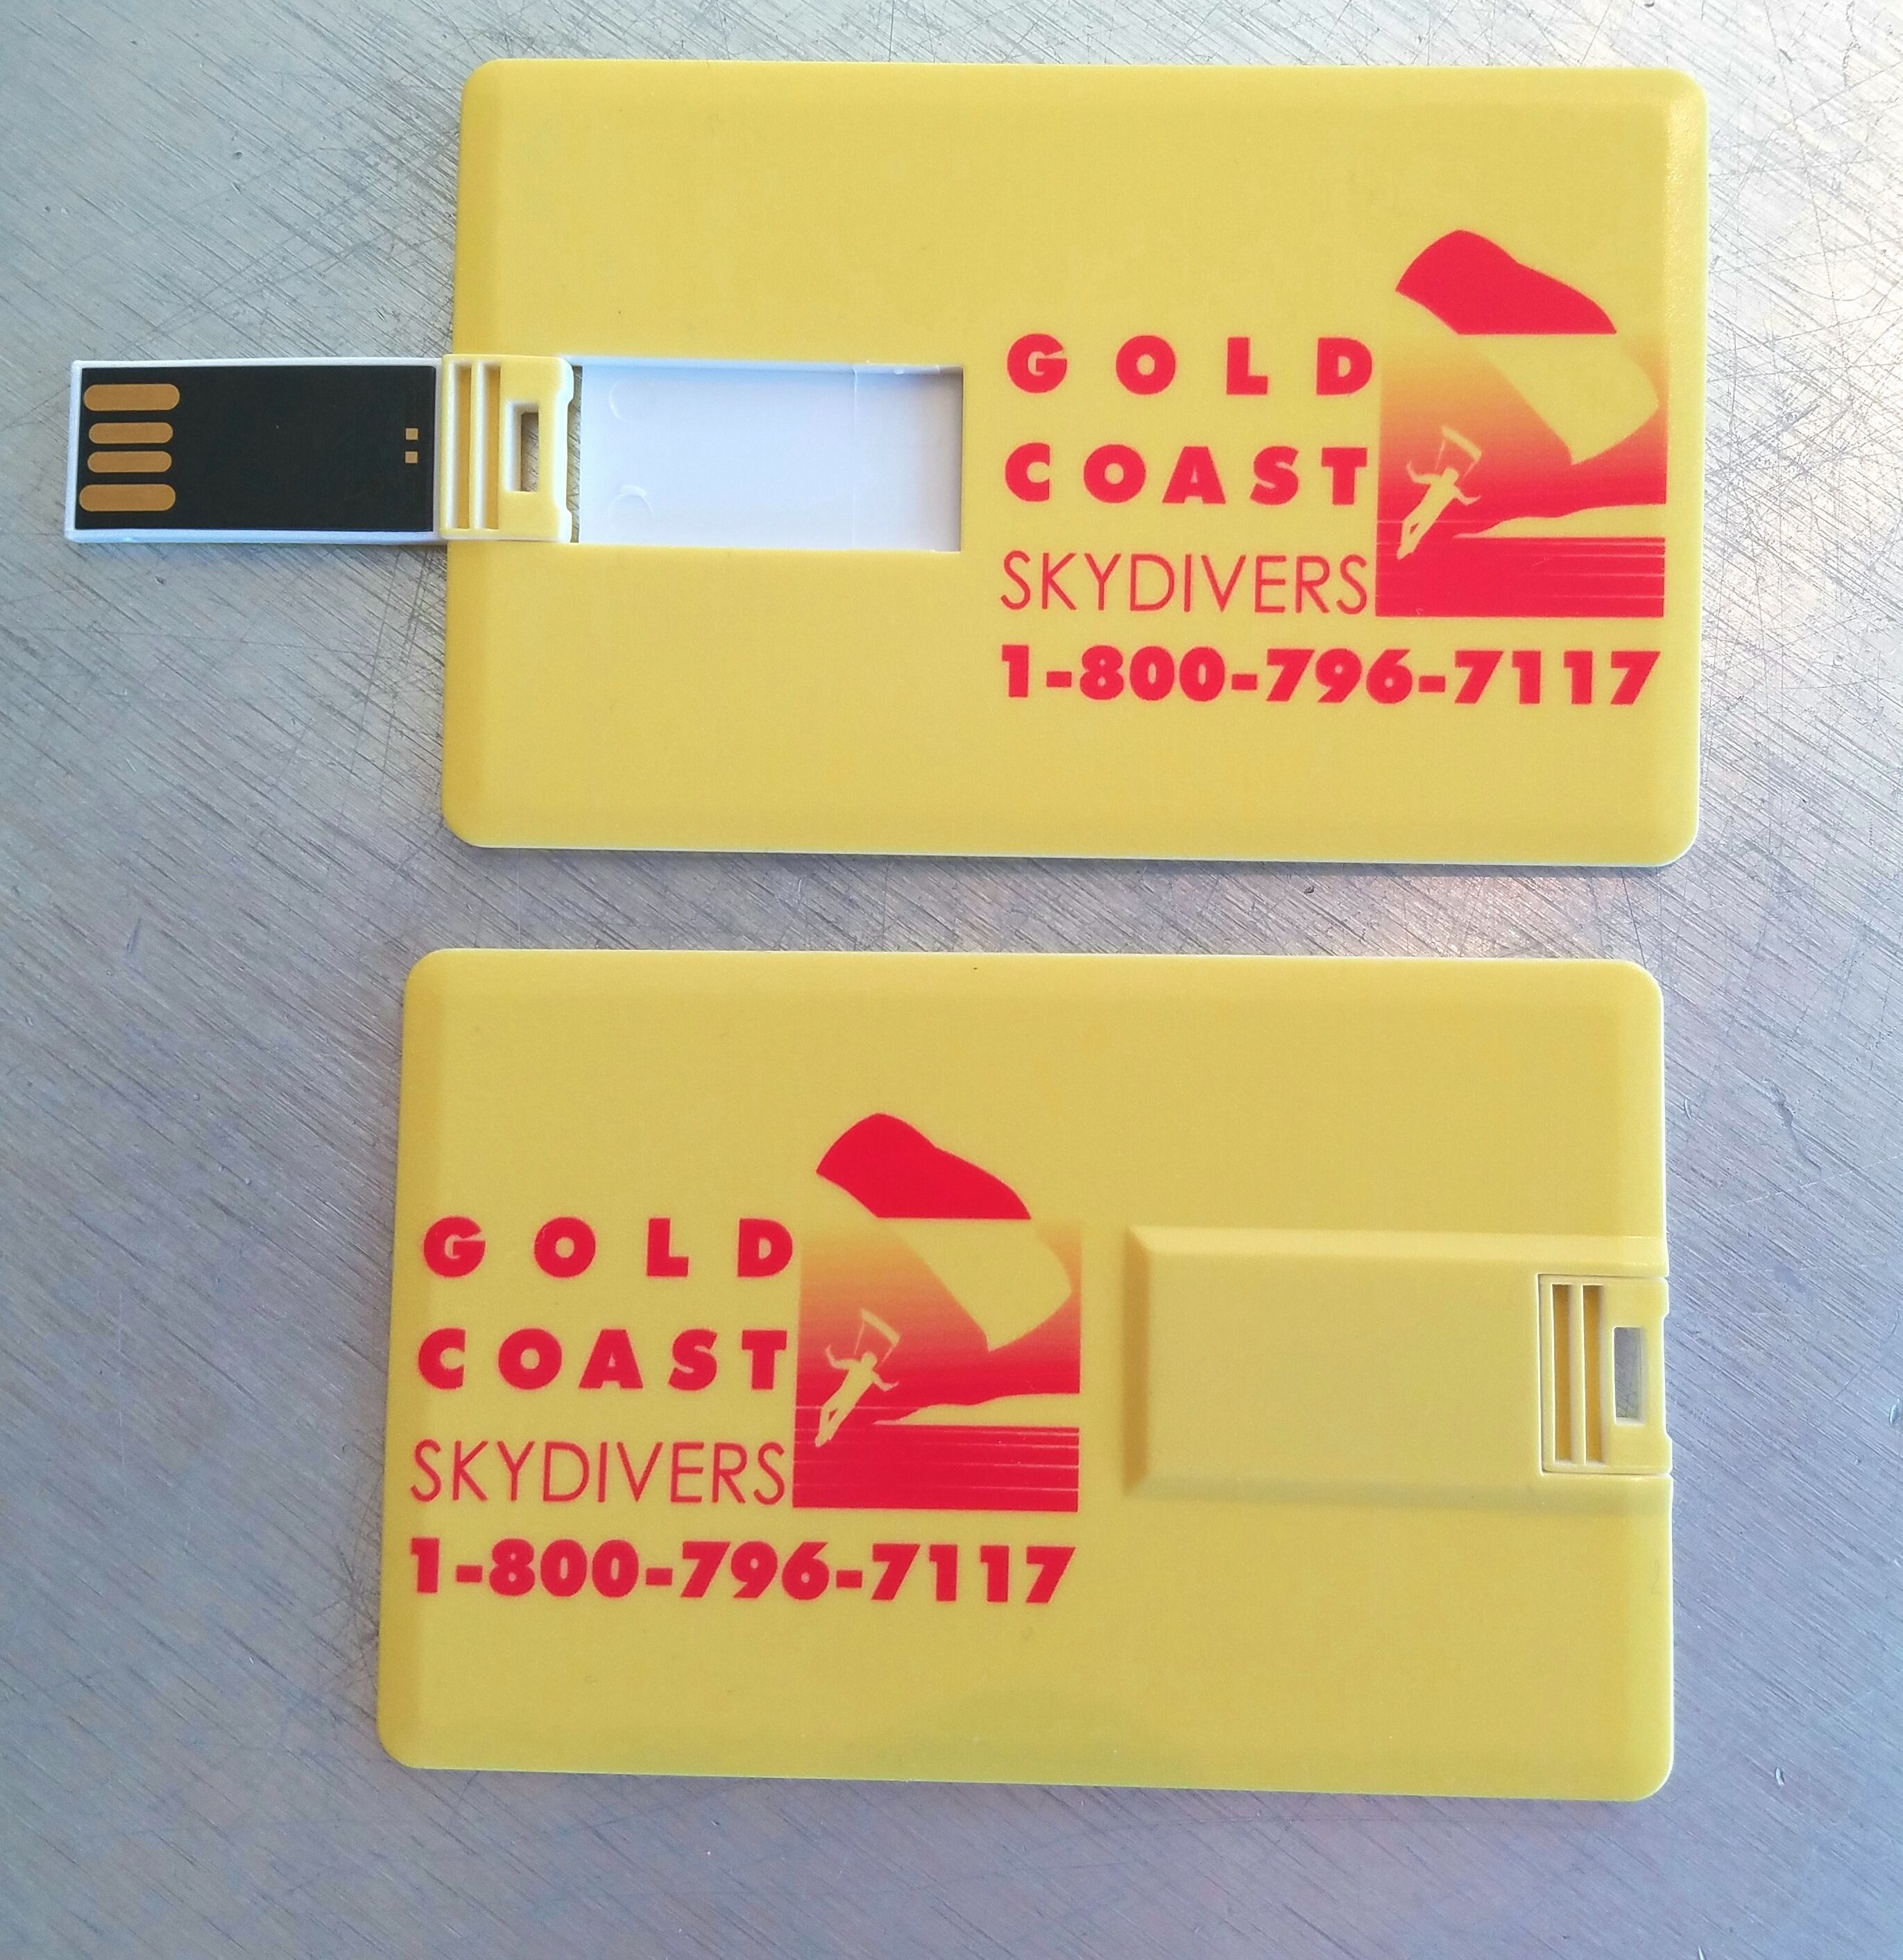 Gold Coast Business Card Style Usb Flash Drives Look Great New Website Coming Very Soon Http Yourmemorystix Com Utm Content Buffer Custom Usb Usb Custom